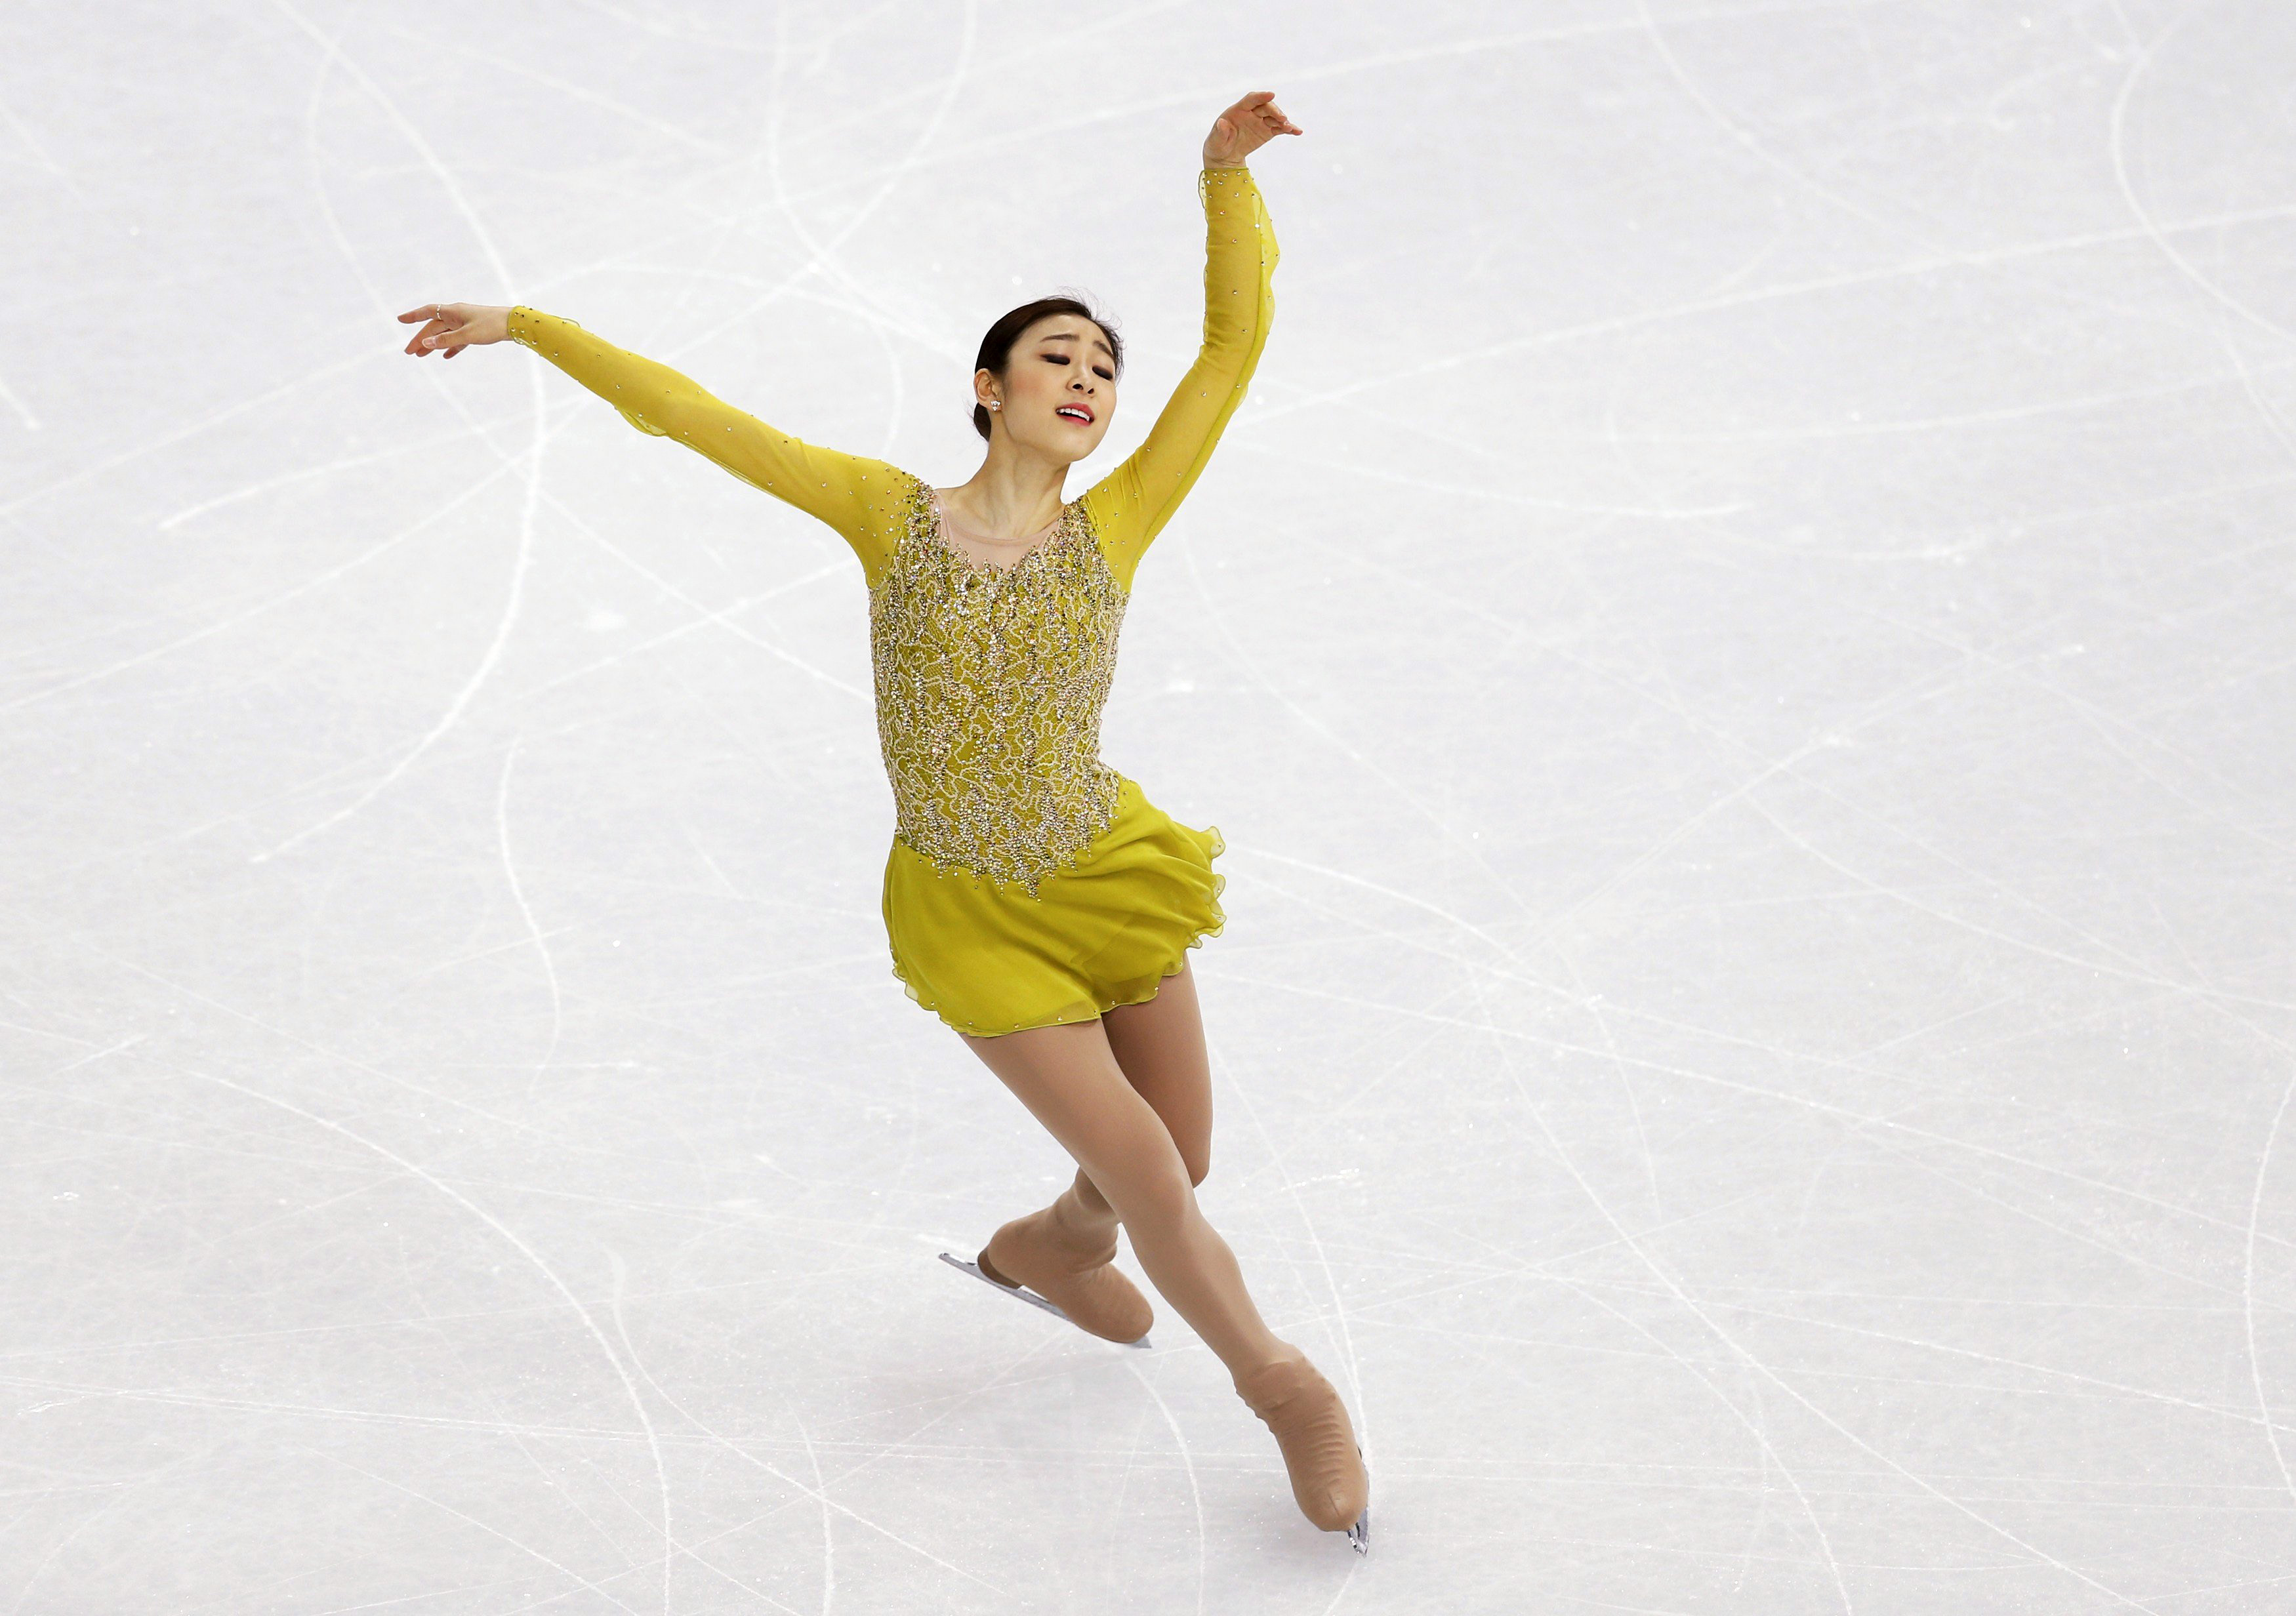 Korea's Yuna Kim competes during the Figure Skating Women's Short Program.